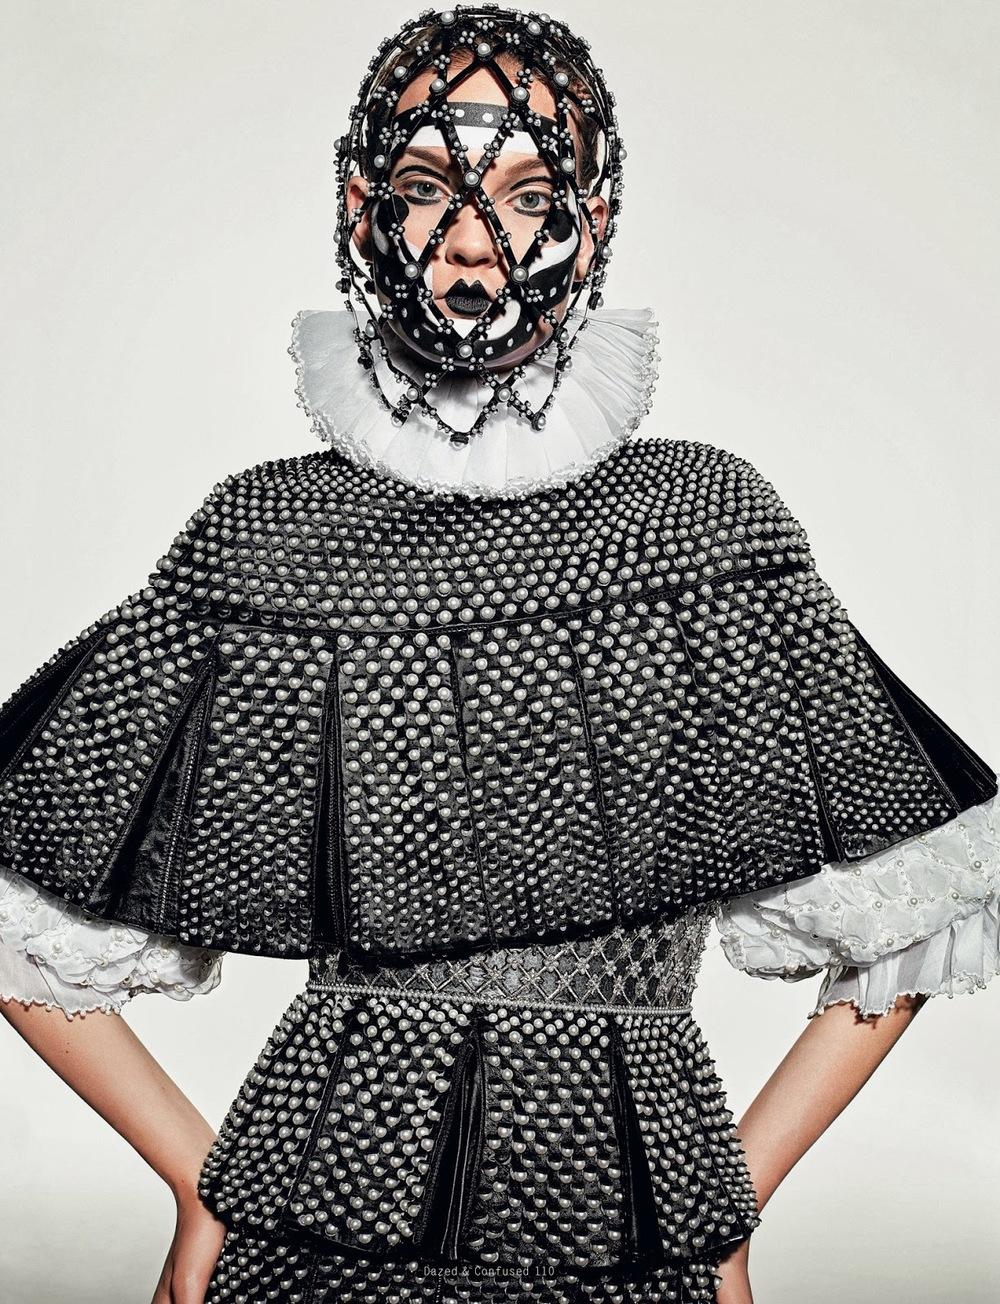 lelaid: Kirsi PyrhoneninVirgin McQueenfor Dazed & Confused, November 2013 Shot by Richard Burbridge Styled by Robbie Spencer